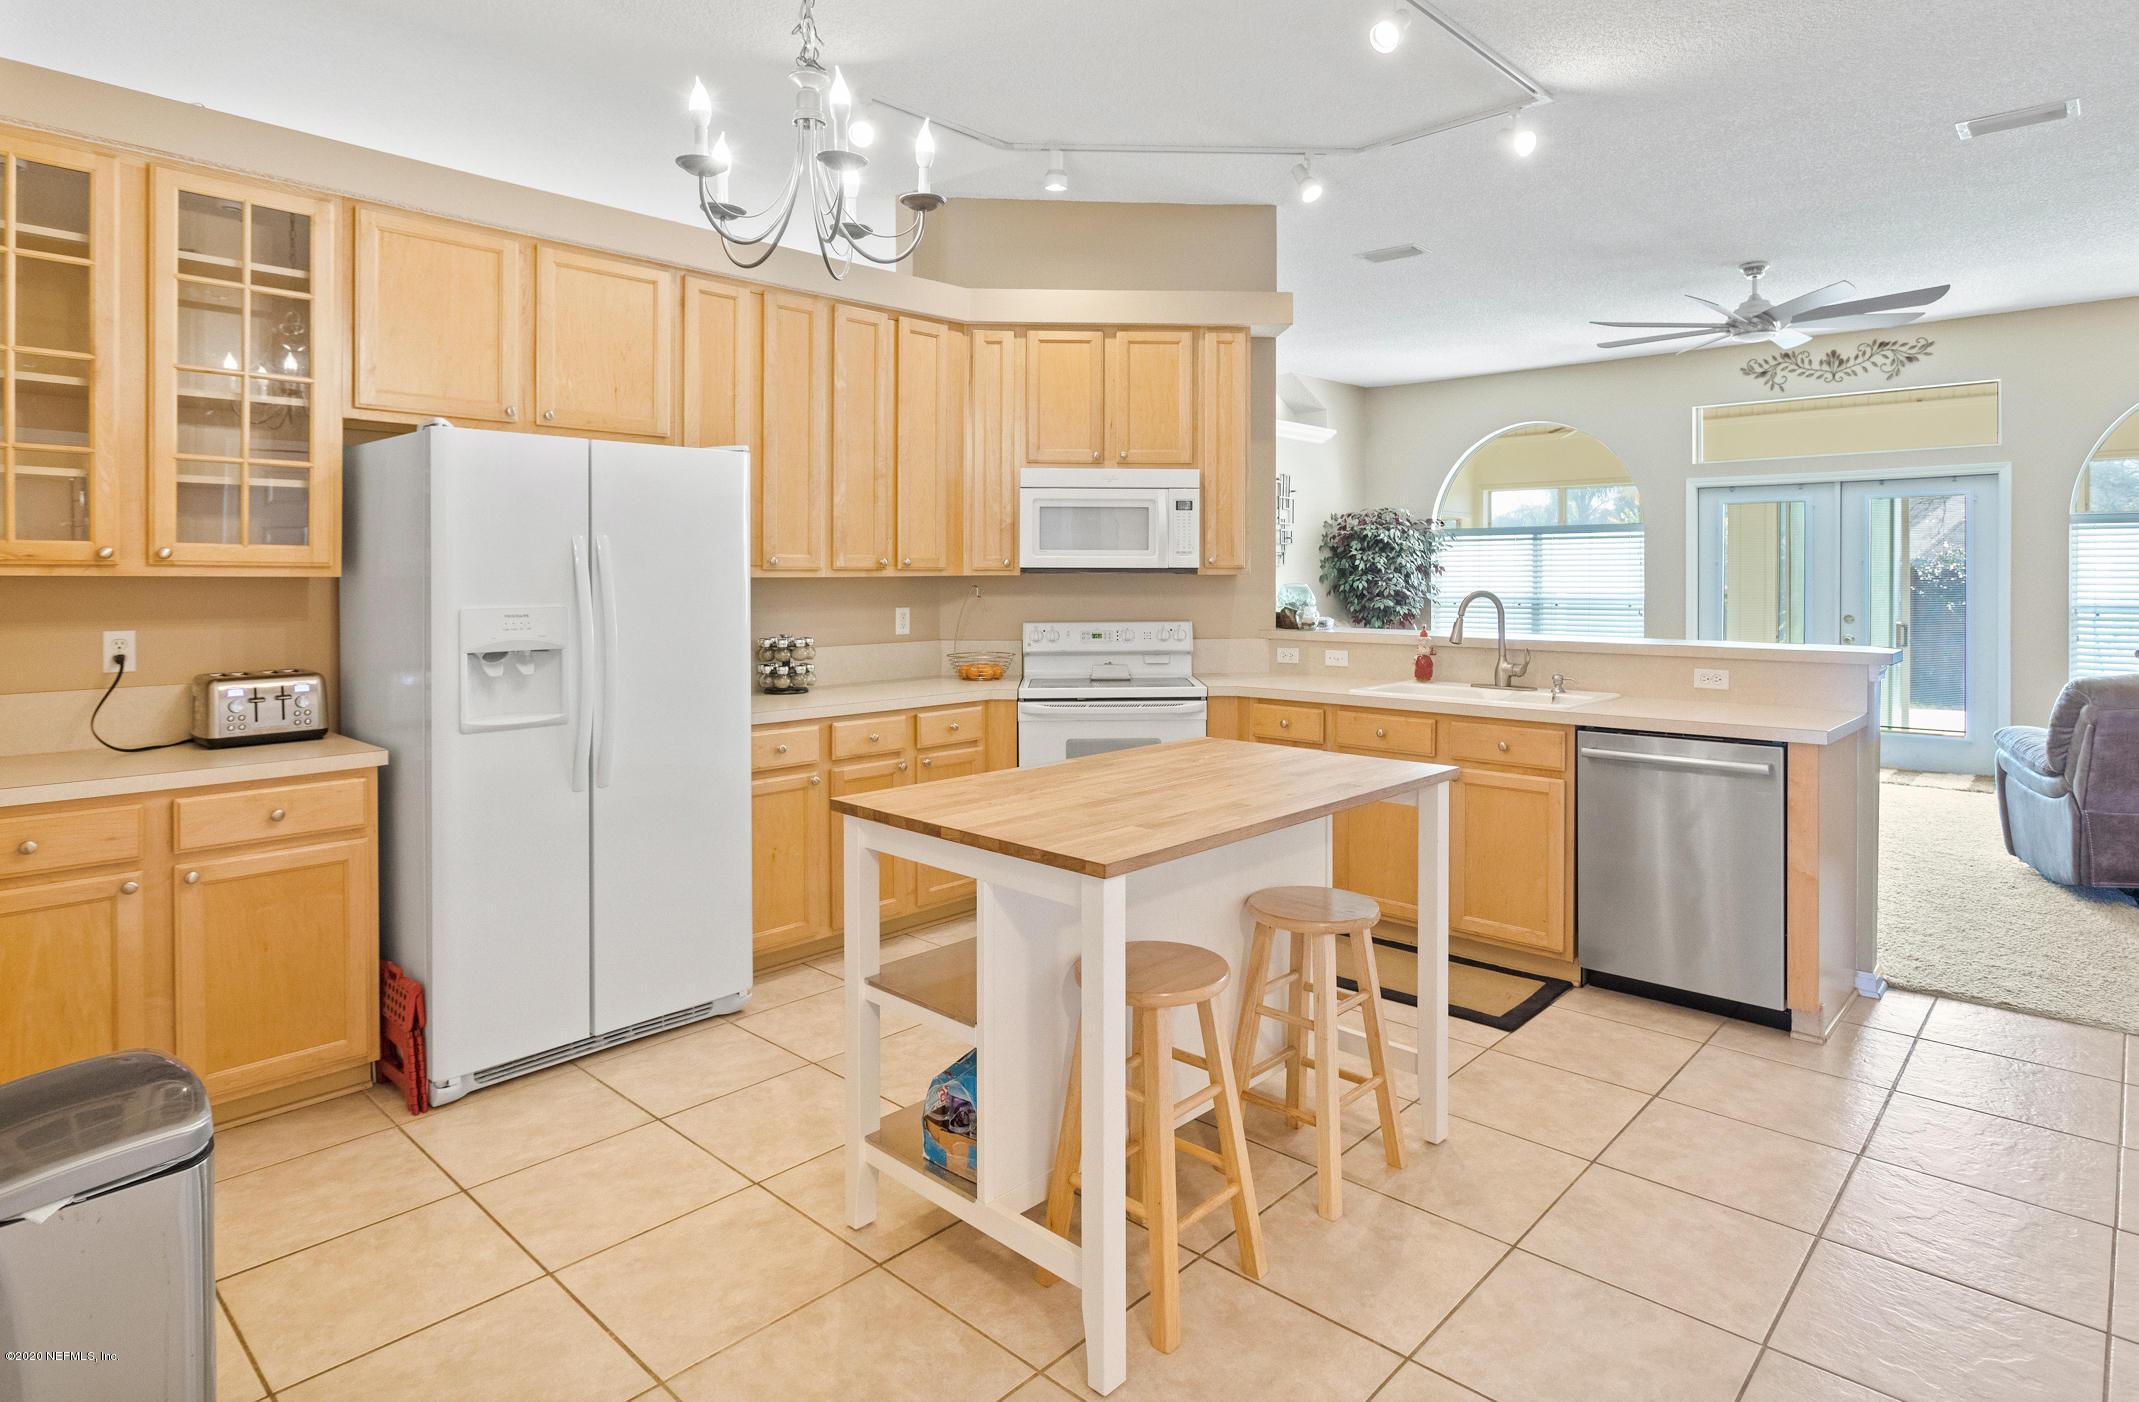 513 THORNBERRY, ORANGE PARK, FLORIDA 32073, 4 Bedrooms Bedrooms, ,2 BathroomsBathrooms,Residential,For sale,THORNBERRY,1034428